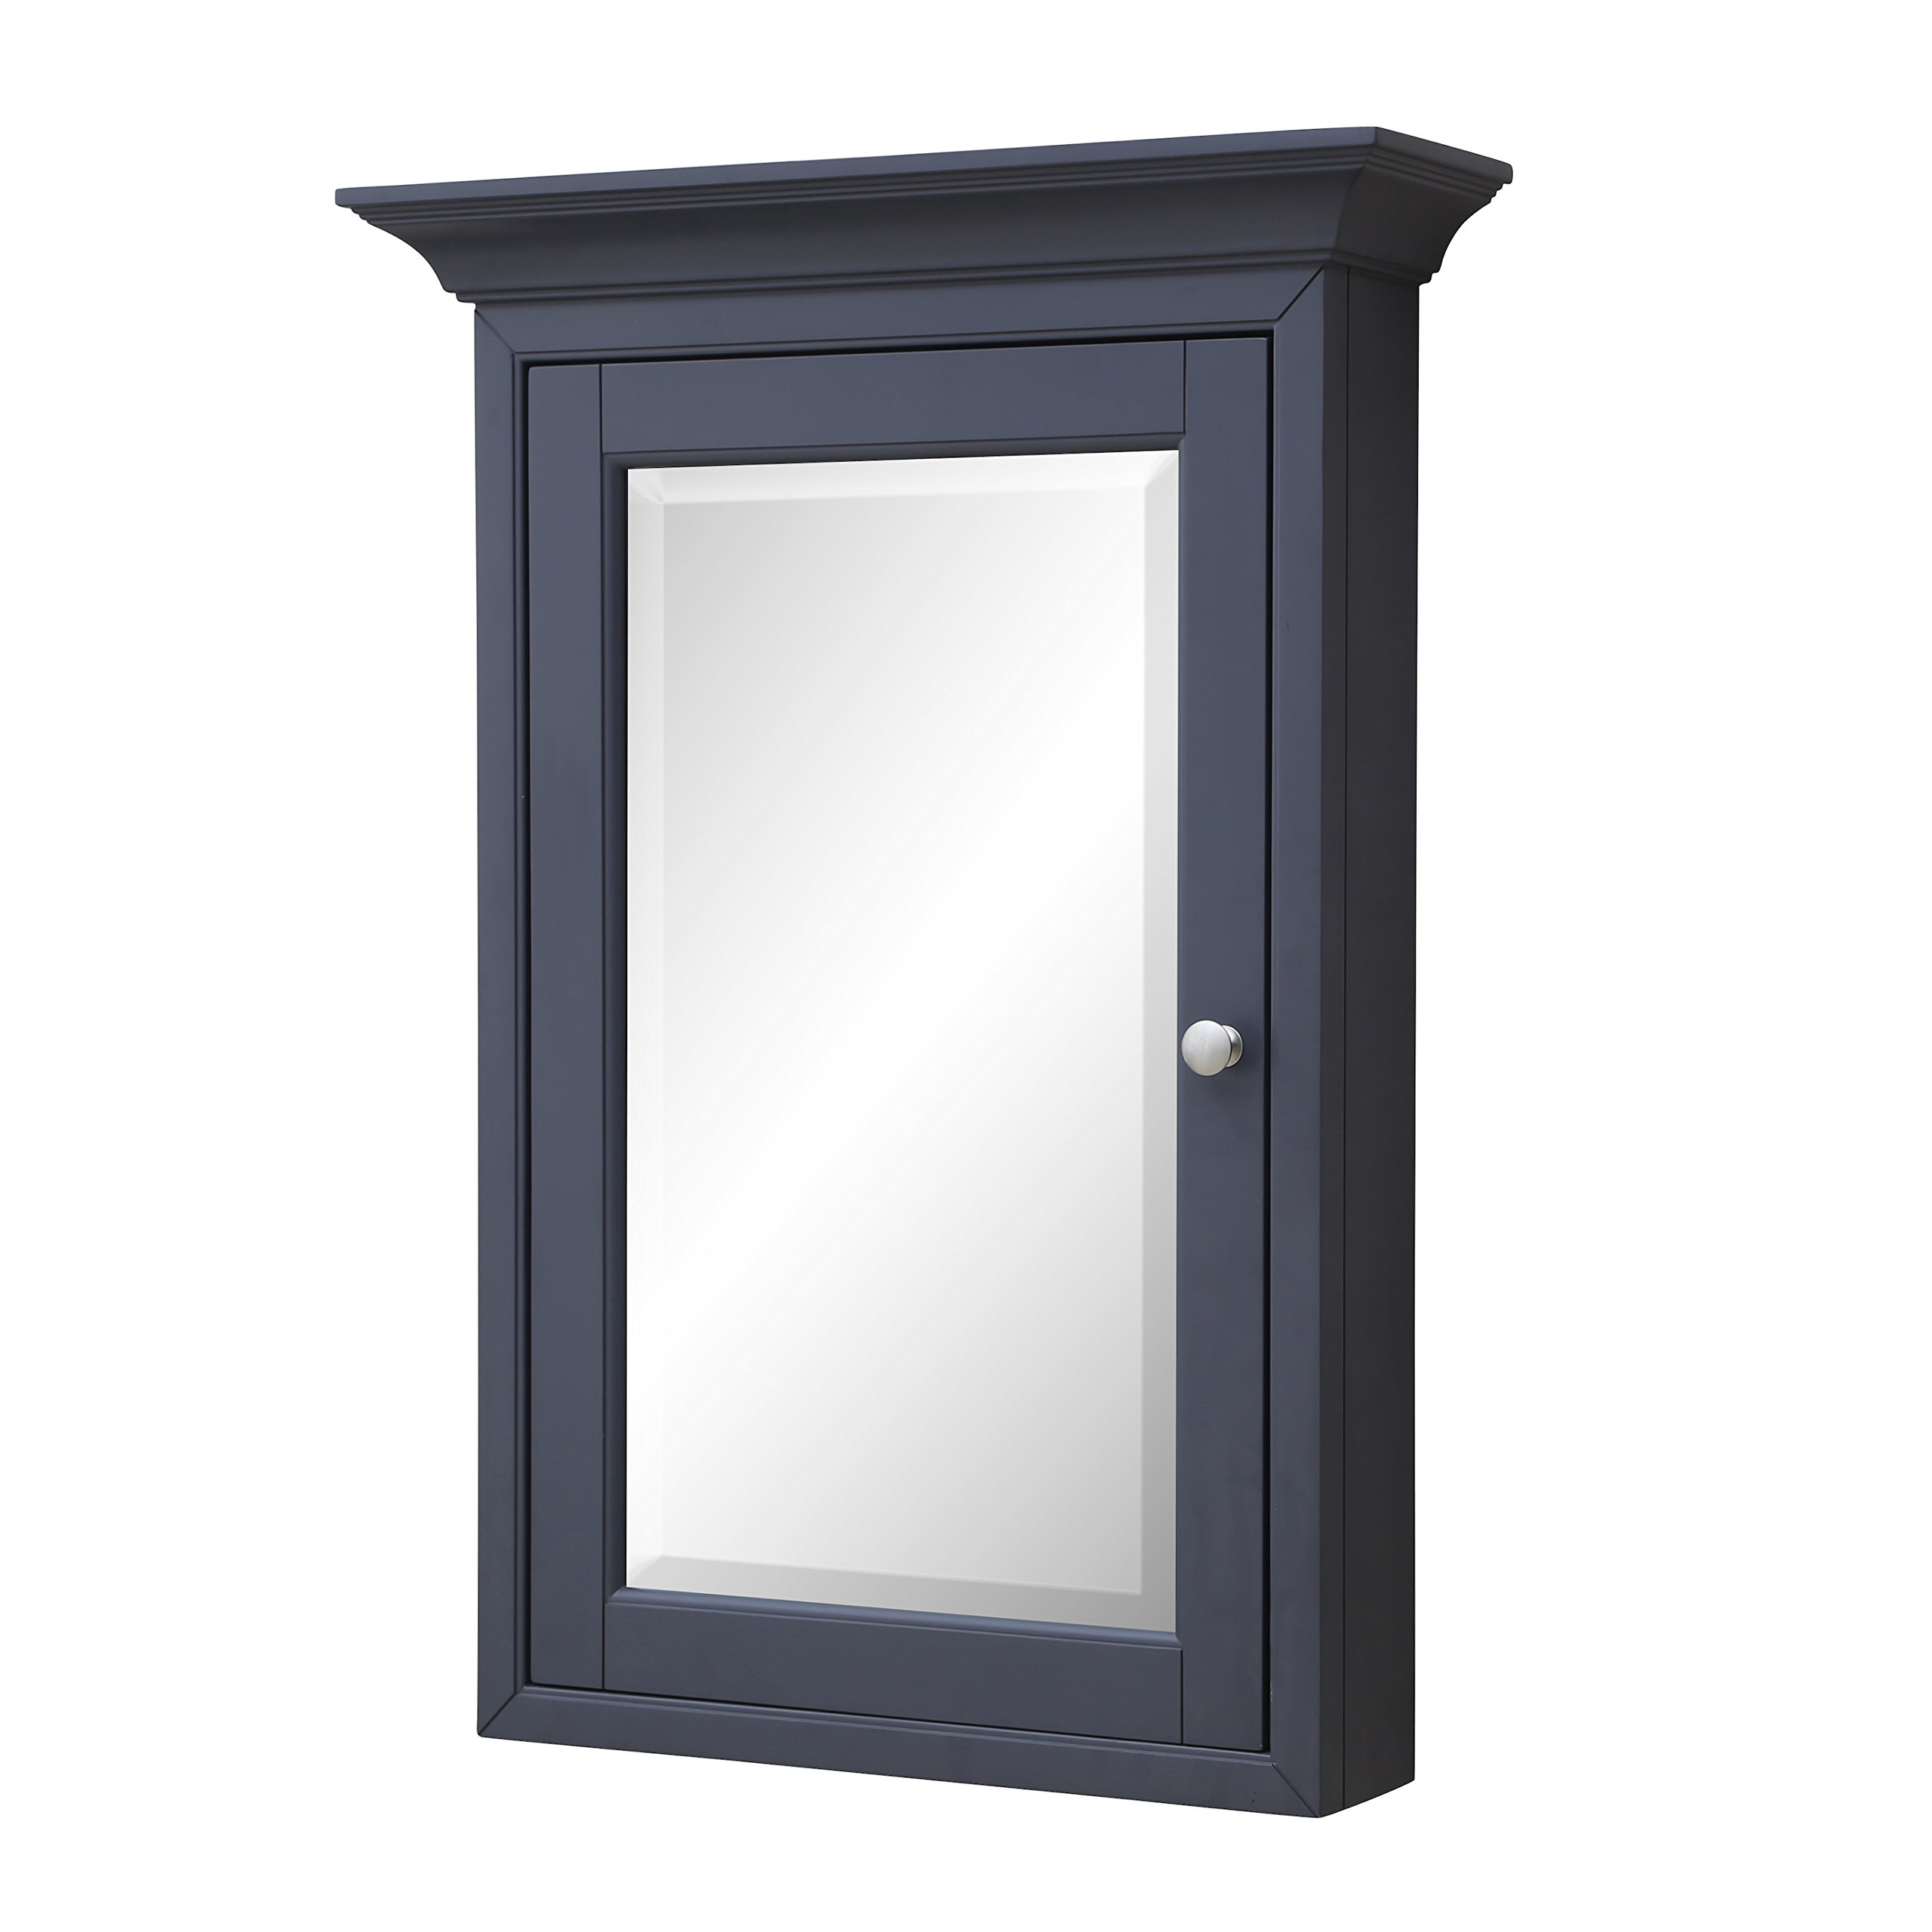 Newport Wall-Mounted Medicine Cabinet (Charcoal Gray)